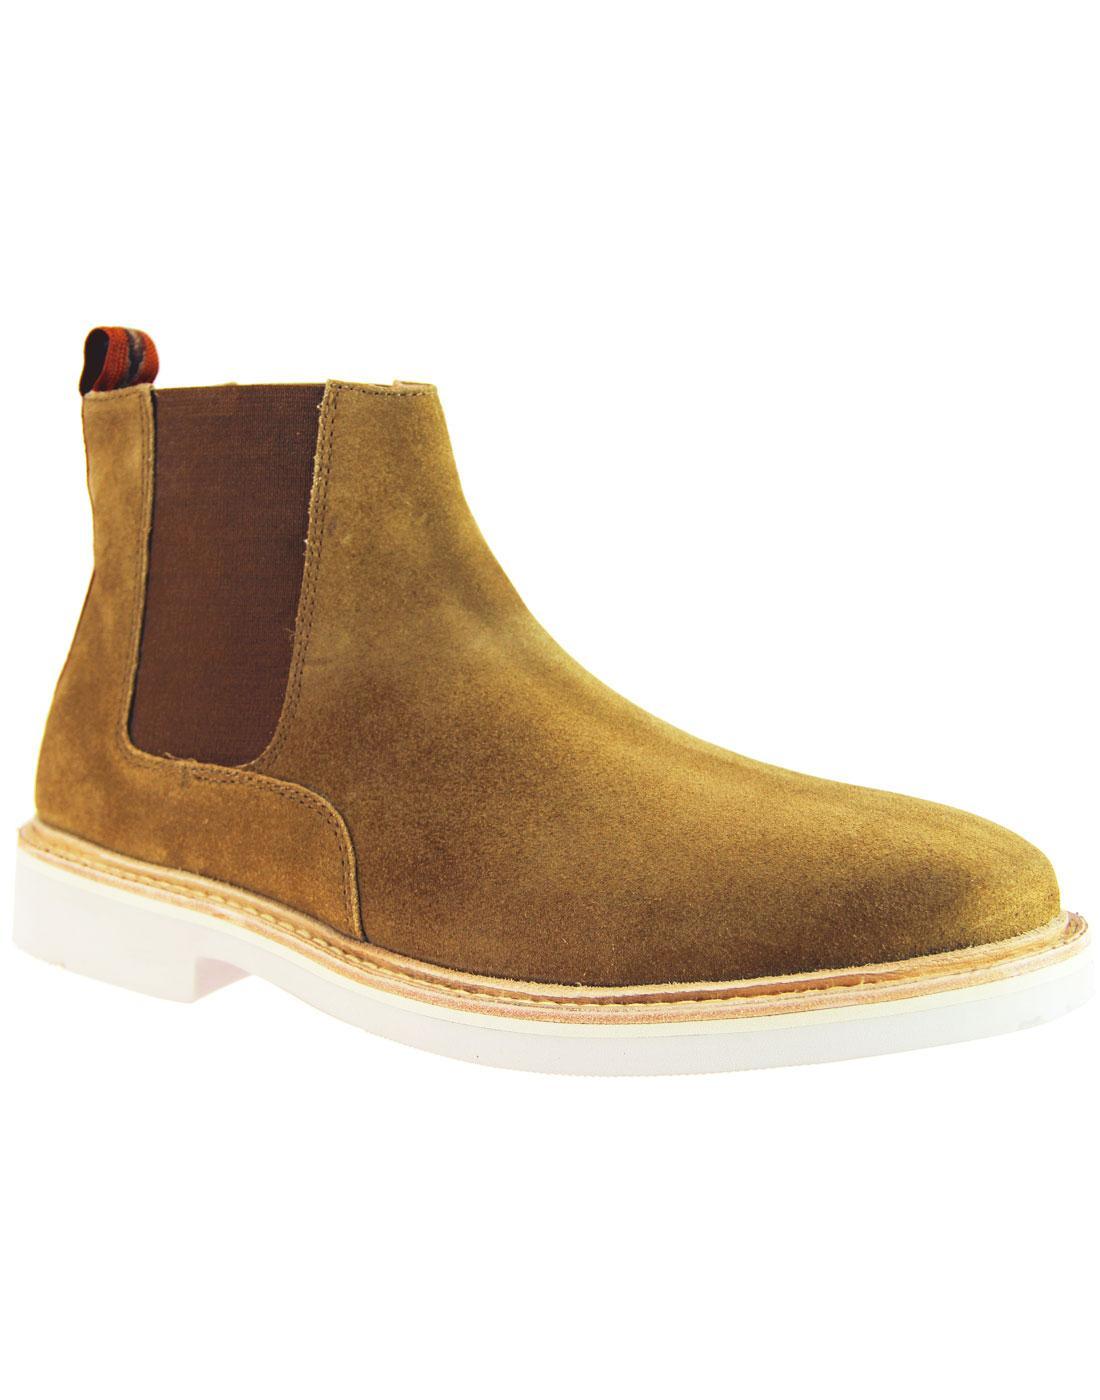 Gallant HUDSON 366 Mod Suede Chelsea Boots TAN